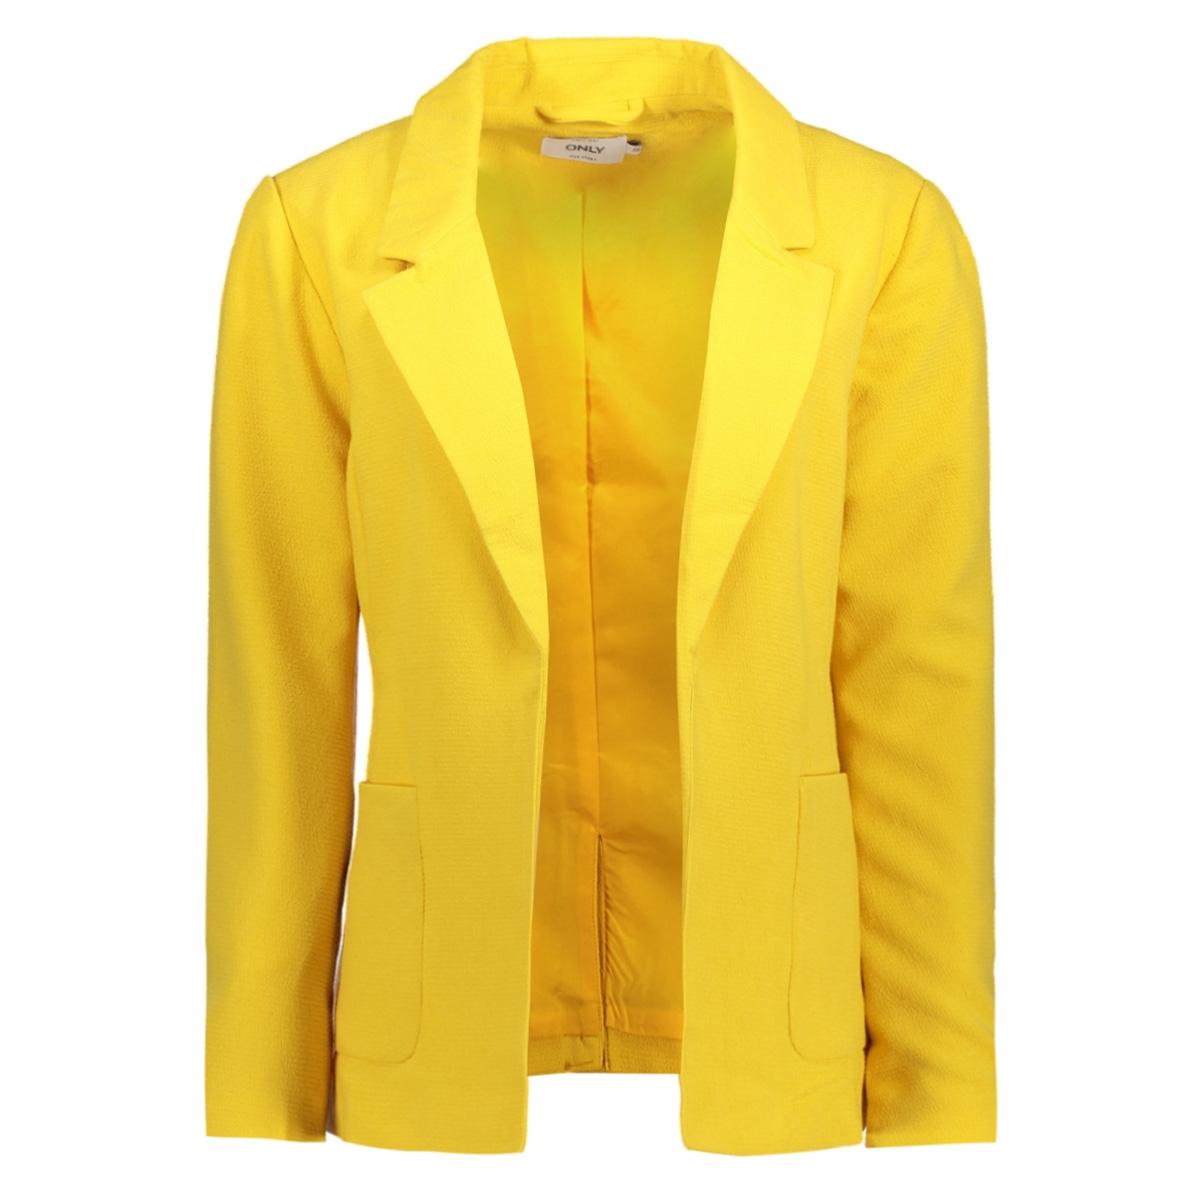 Blazers Dublin: Onldublin Blazer Otw 15129500 Only Blazer Spicy Mustard